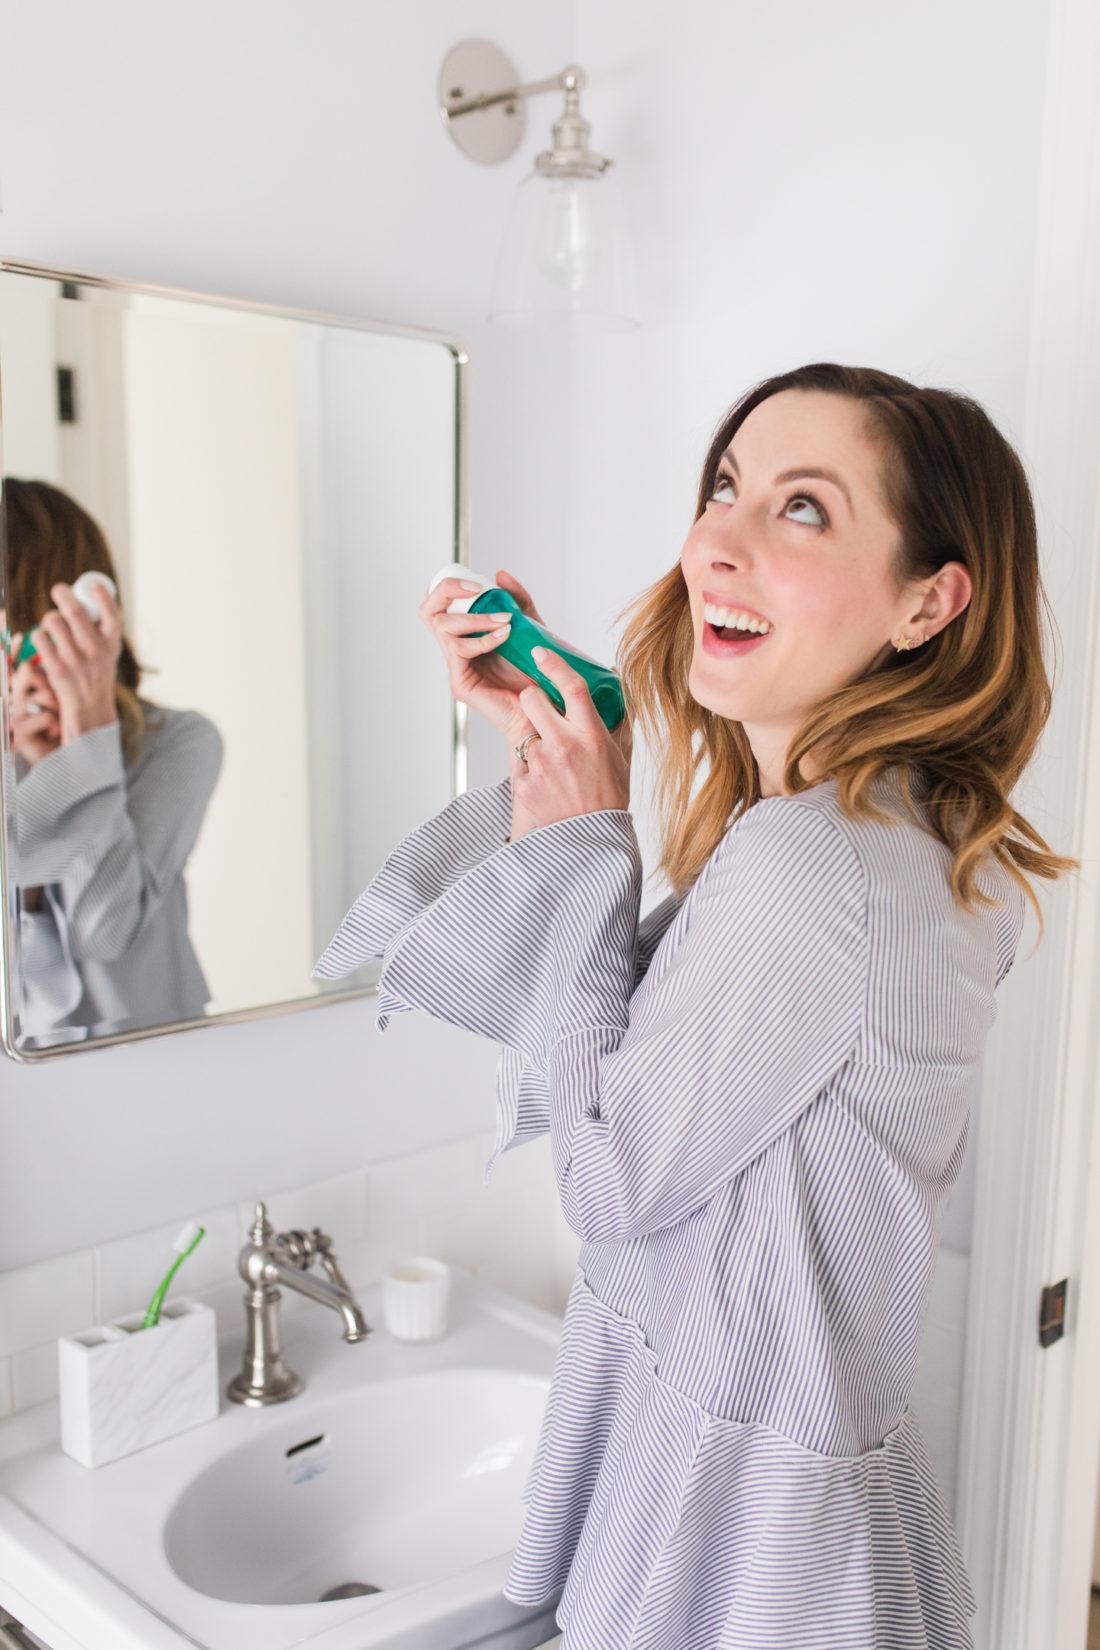 Eva Amurri Martino shakes up a bottle of Colgate Advanced Health mouthwash